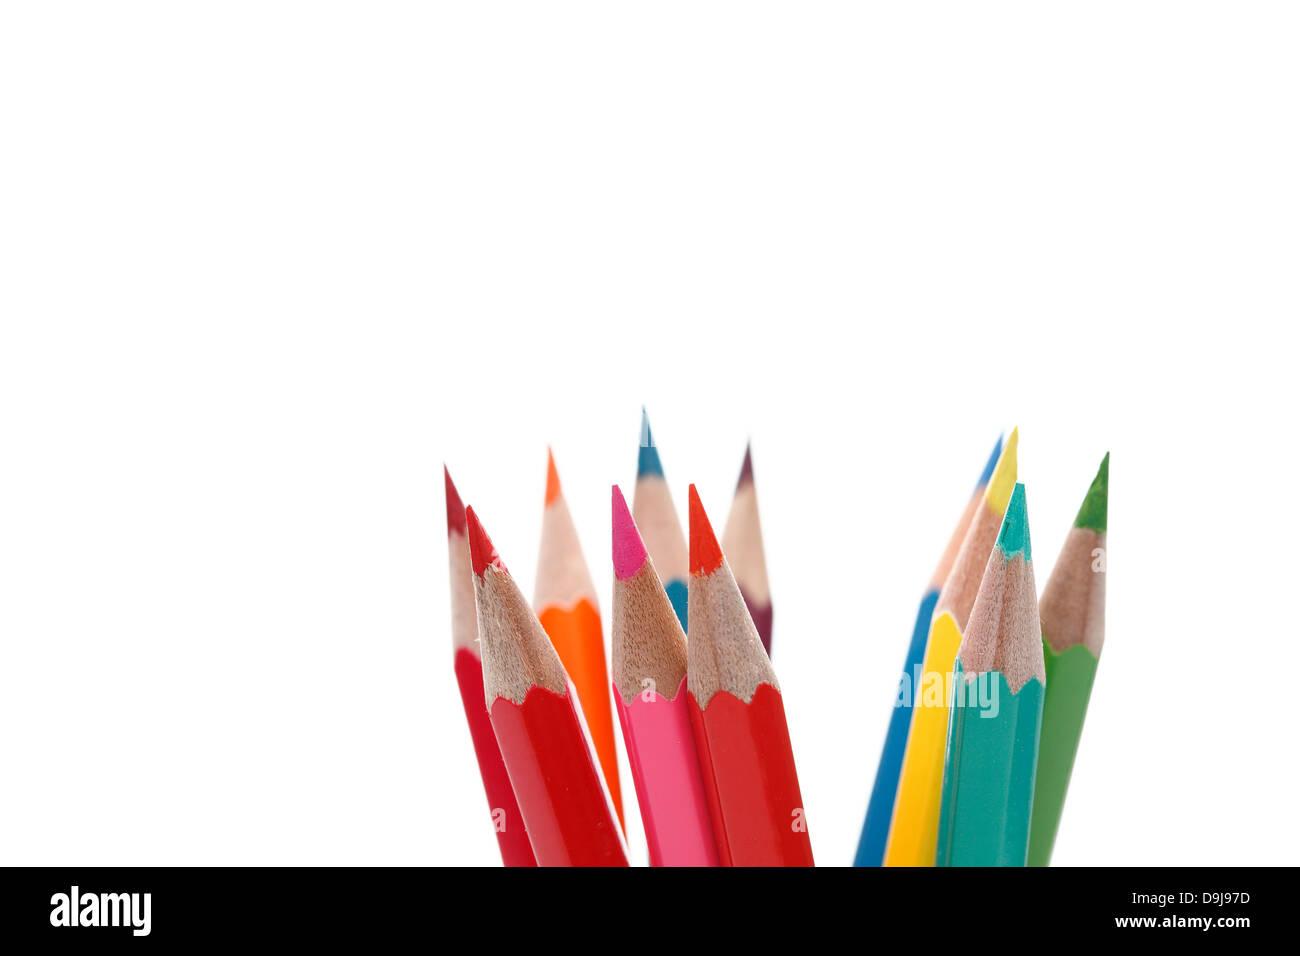 A Colored pencil. - Stock Image